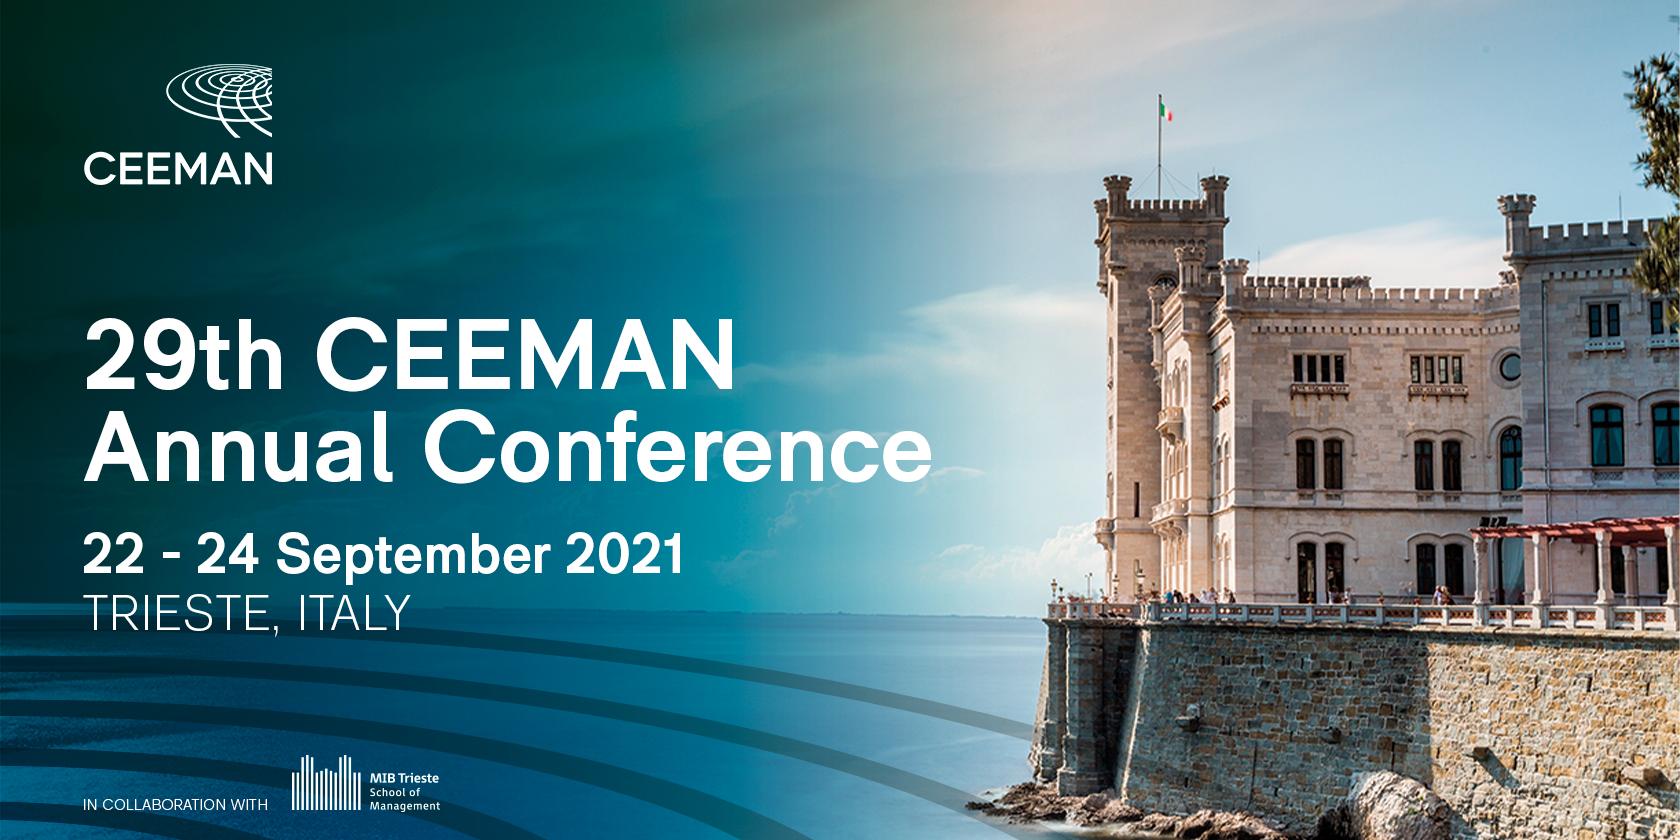 CEEMAN Annual Conference in Trieste Was a Big Success